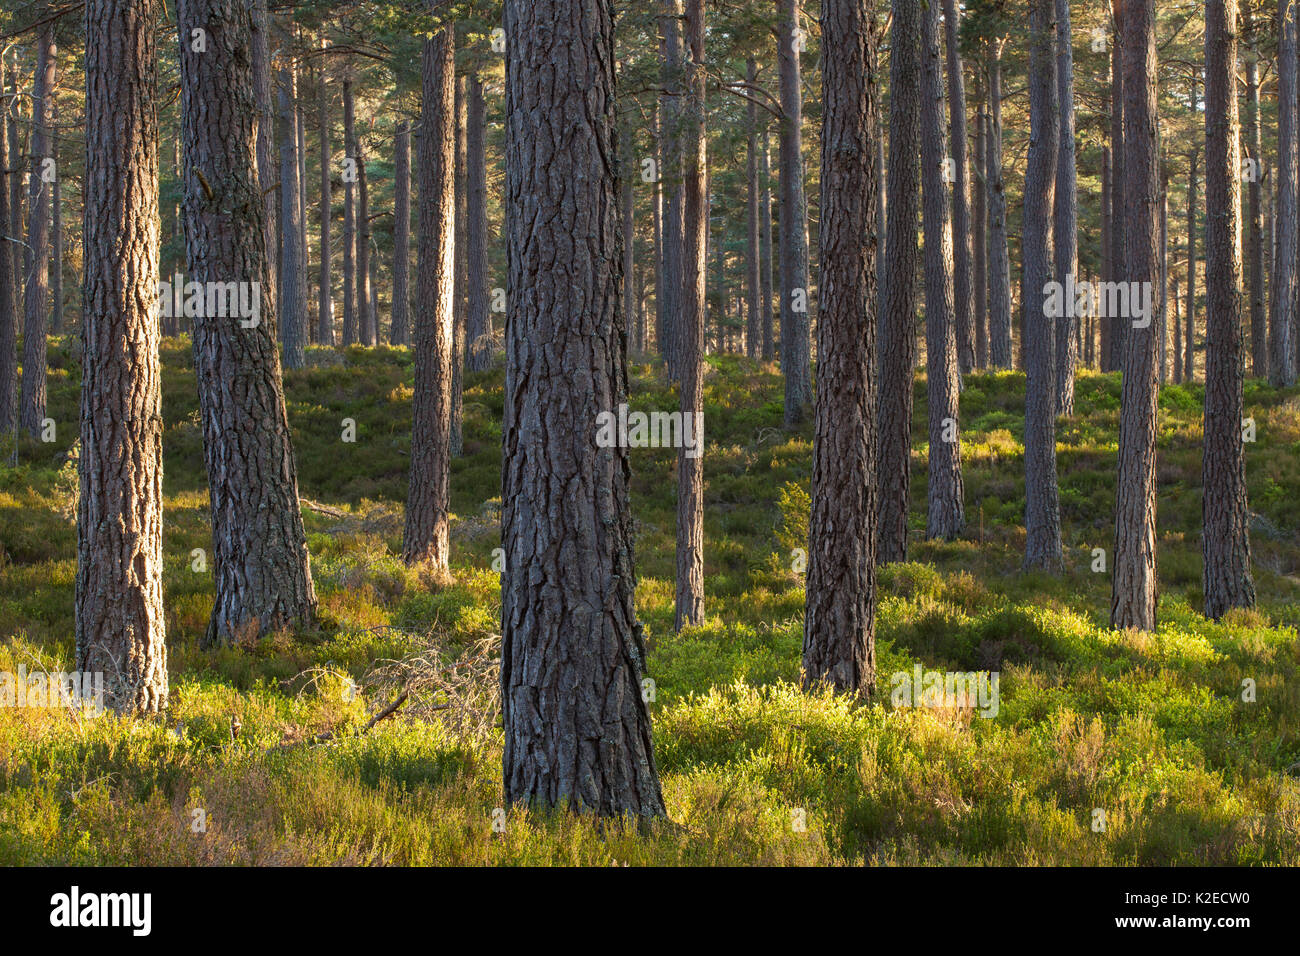 Scots pine (Pinus sylvestris) woodland, Abernethy Forest, Cairngorms National Park, Scotland, UK, May. - Stock Image